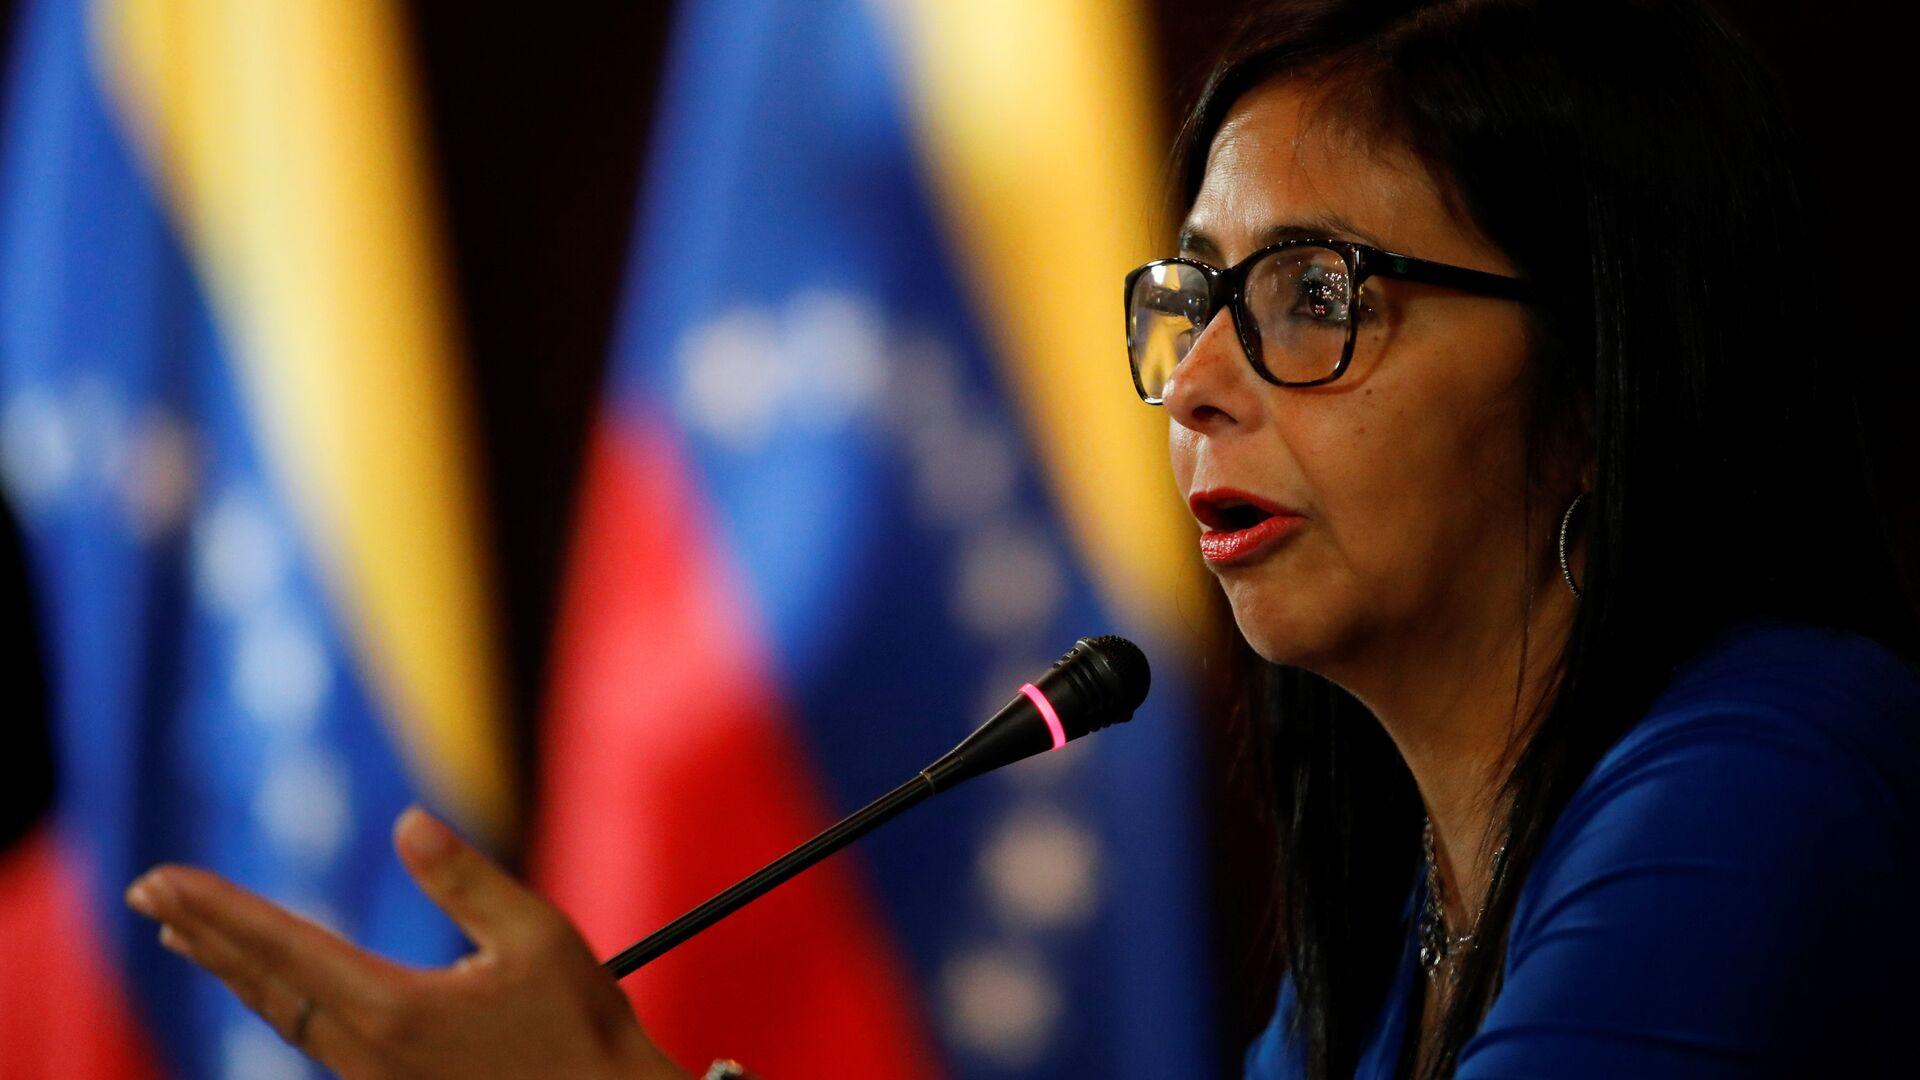 Delcy Rodríguez, vicepresidenta de Venezuela - Sputnik Mundo, 1920, 15.09.2021